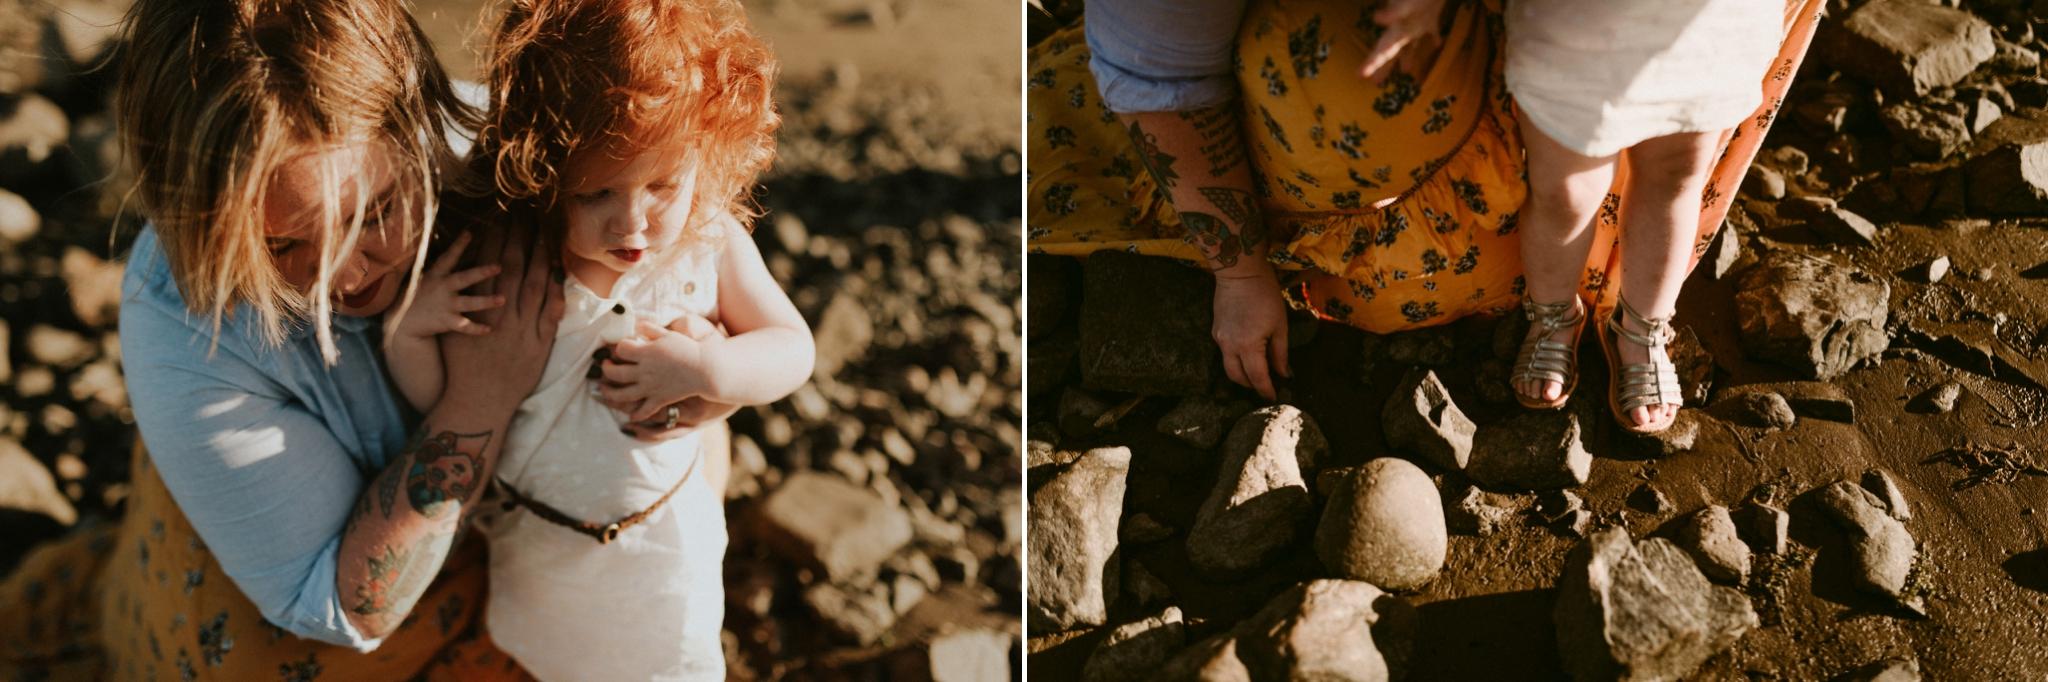 Columbia-River-Gorge-Adventurous-Intimate-Family-Session-Kerlyn-Van-Gelder-Photography-Portland-Oregon-Family-Photographer